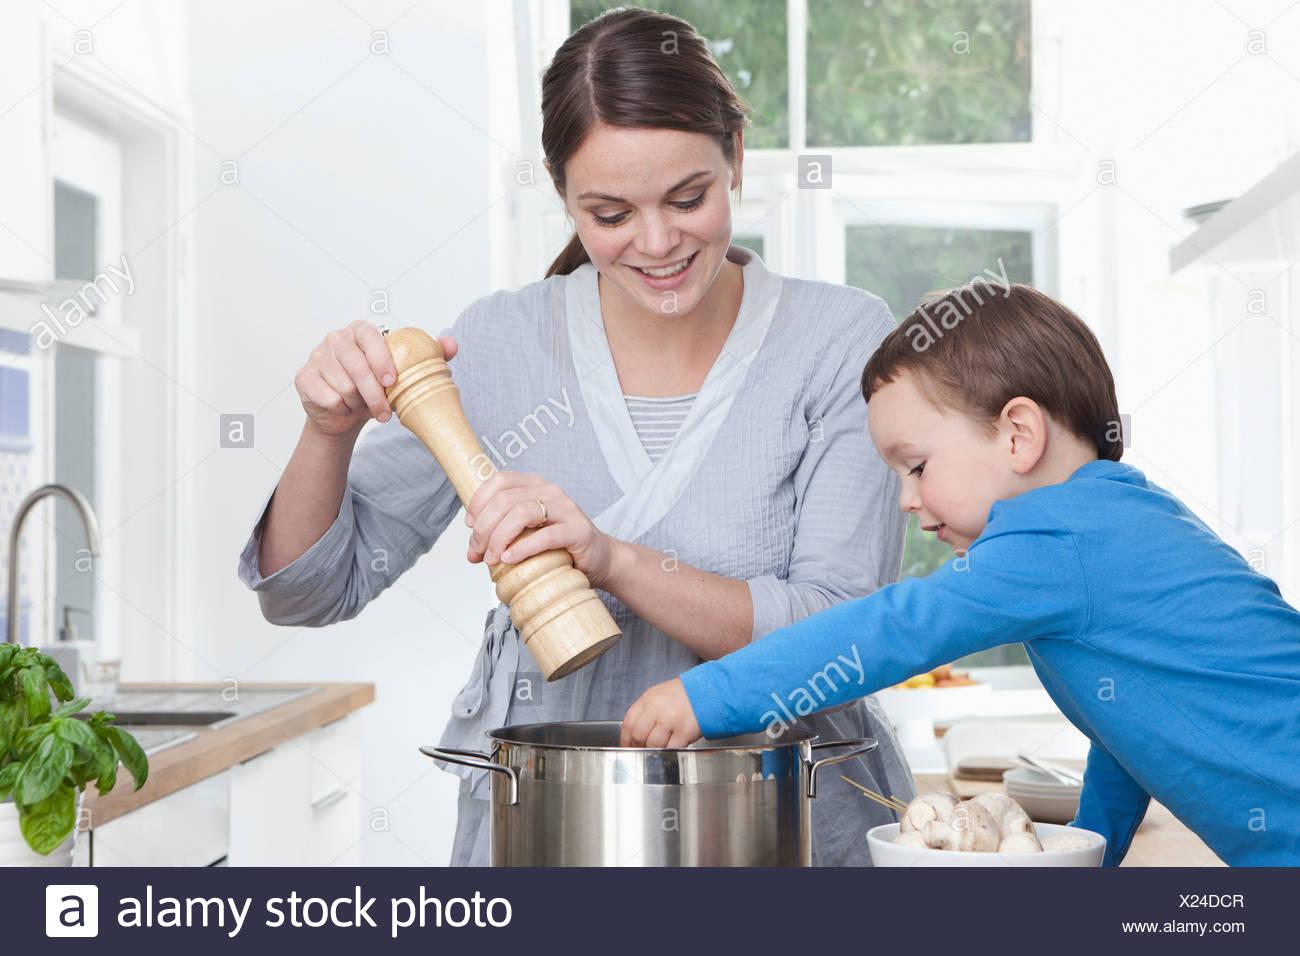 Mom anal captions